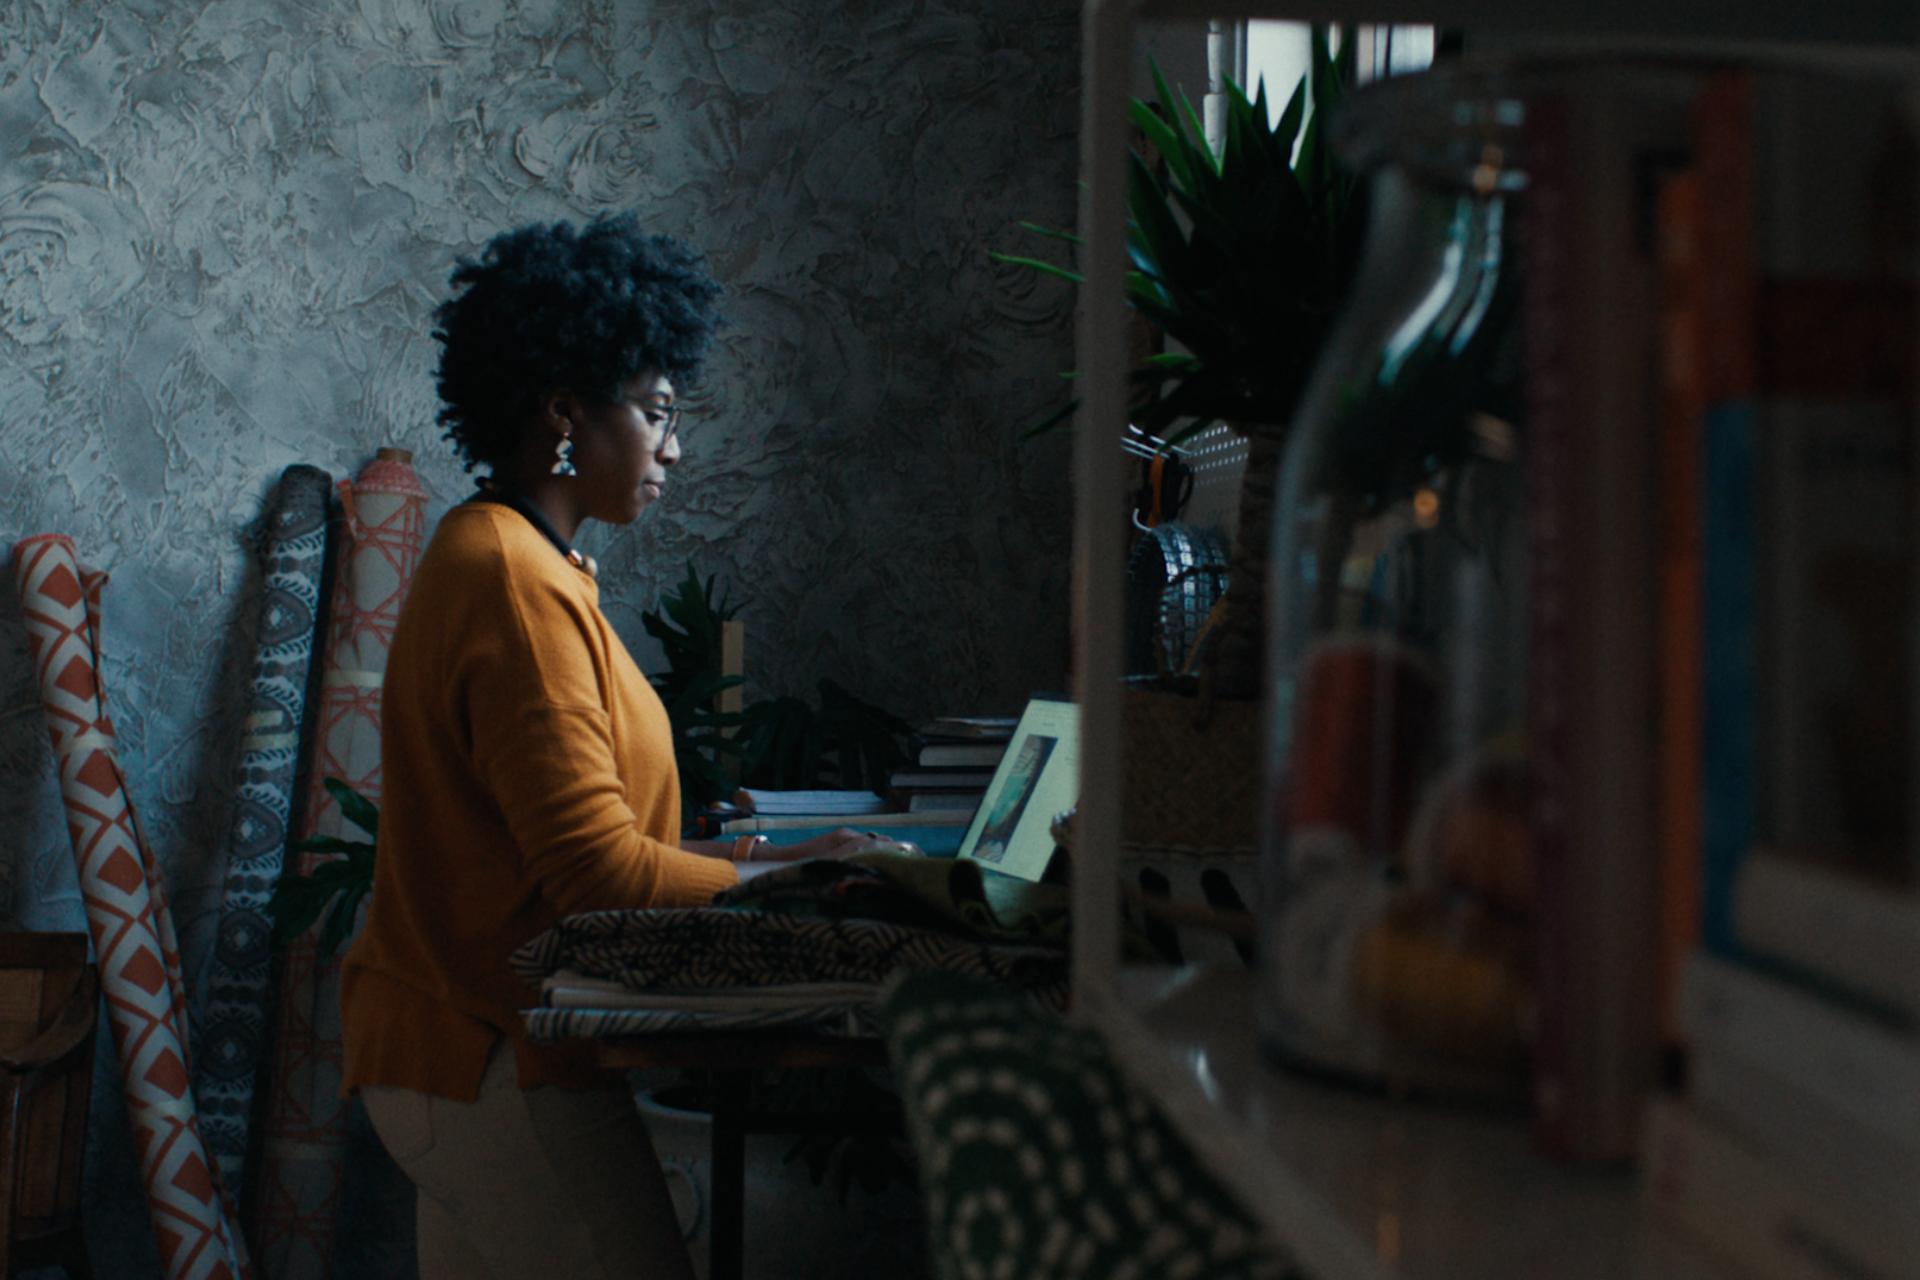 Furniture designer Nicole Crowder at work on her laptop